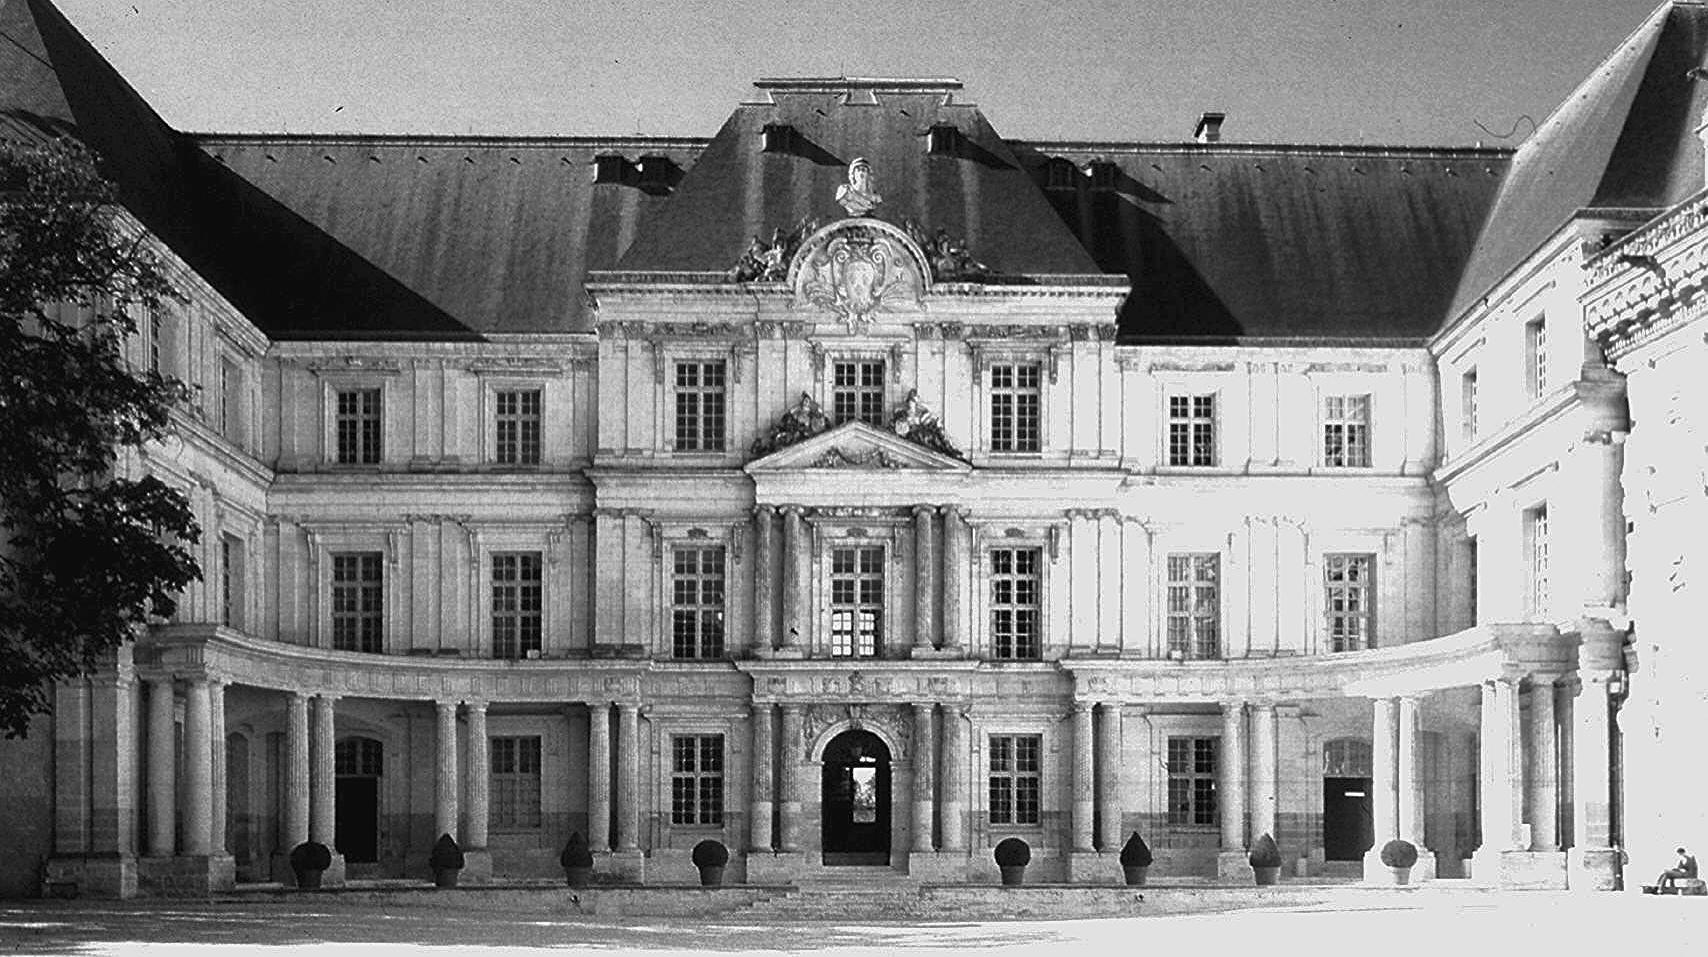 renaissance__blois_chateau_orleans_wing_ext1319569539543_edited.jpg